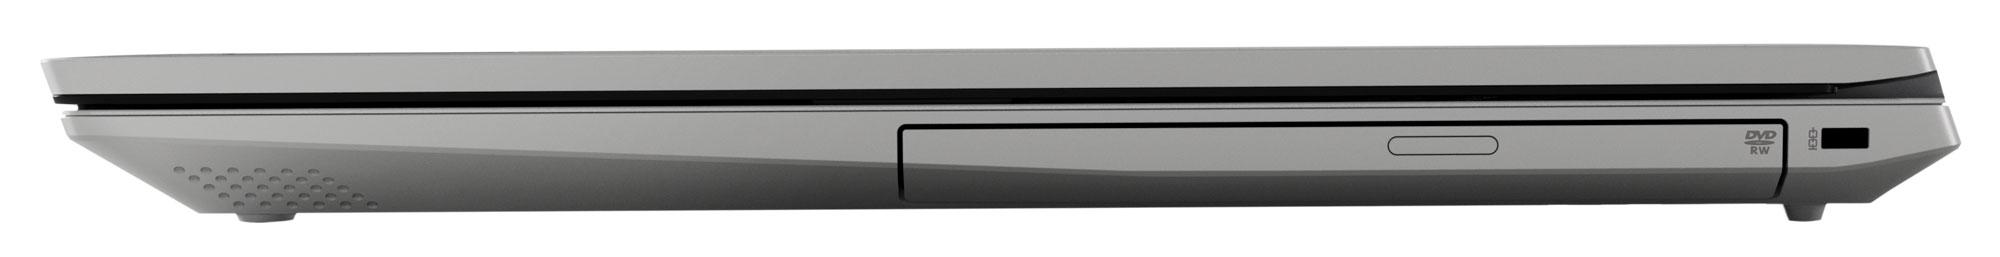 Фото  Ноутбук Lenovo ideapad L340-17IWL Platinum Grey (81M00093RE)